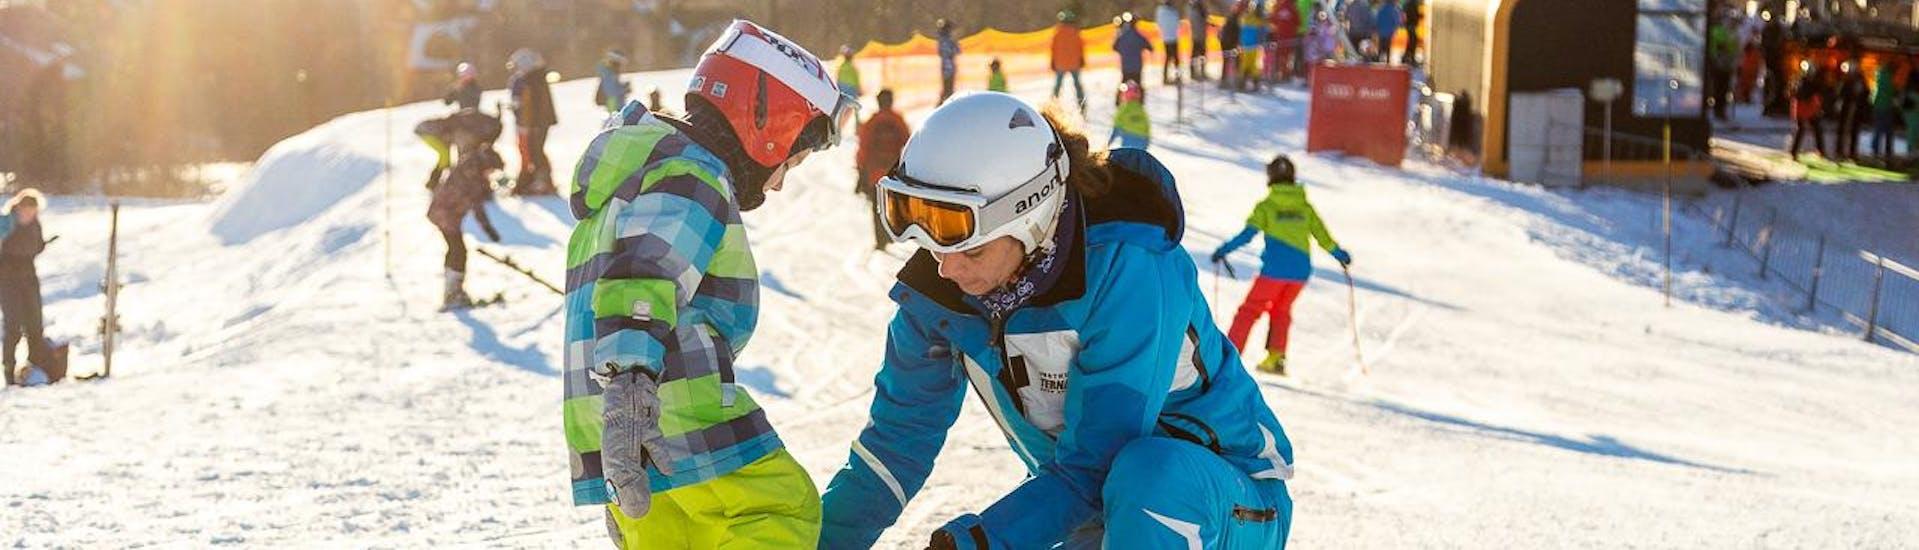 Tatranska Lomnica Ski Instructor Private For Kids From 4 Years From 19 Checkyeti